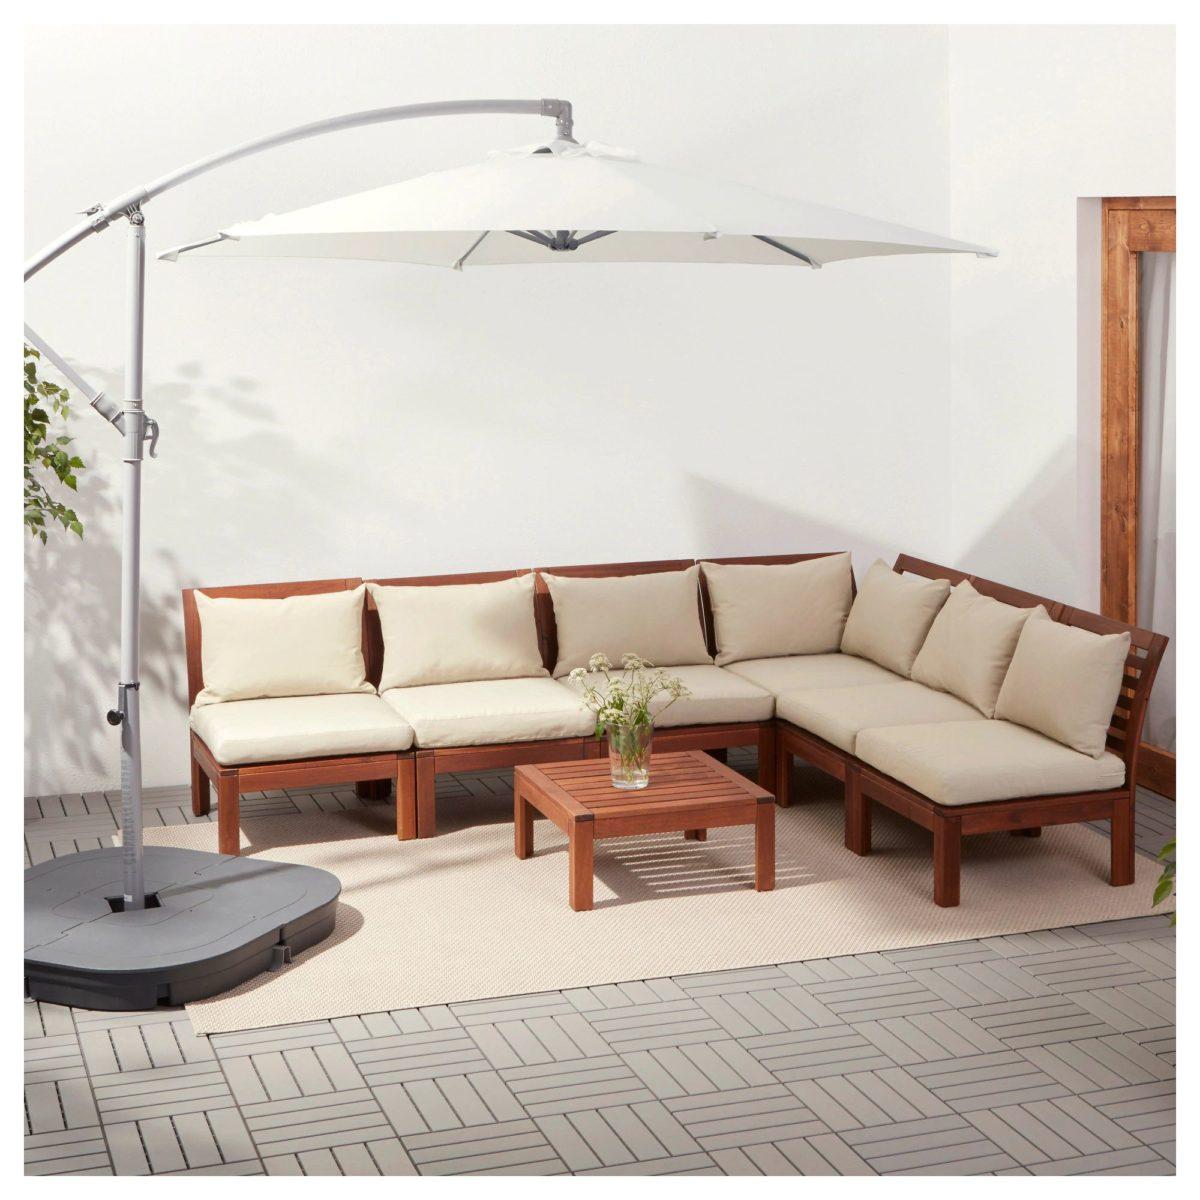 Tavolino Per Balcone Ikea arredo giardino ikea